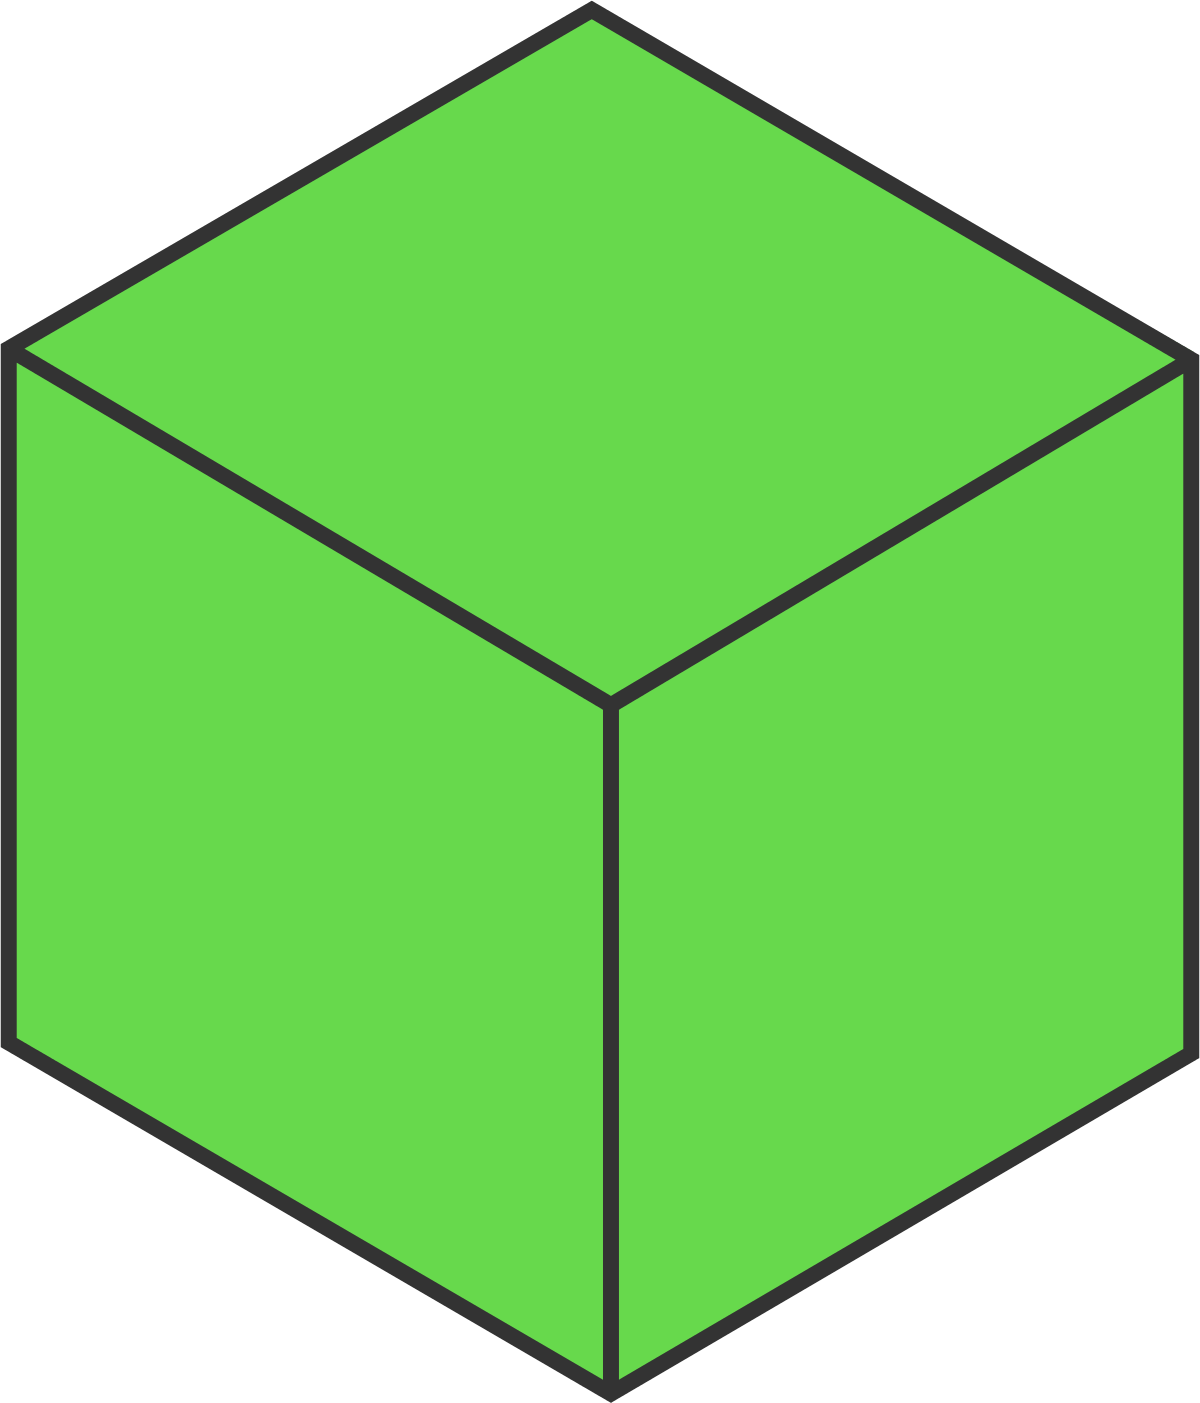 3d Composite Figures Warmup Practice Problems Online